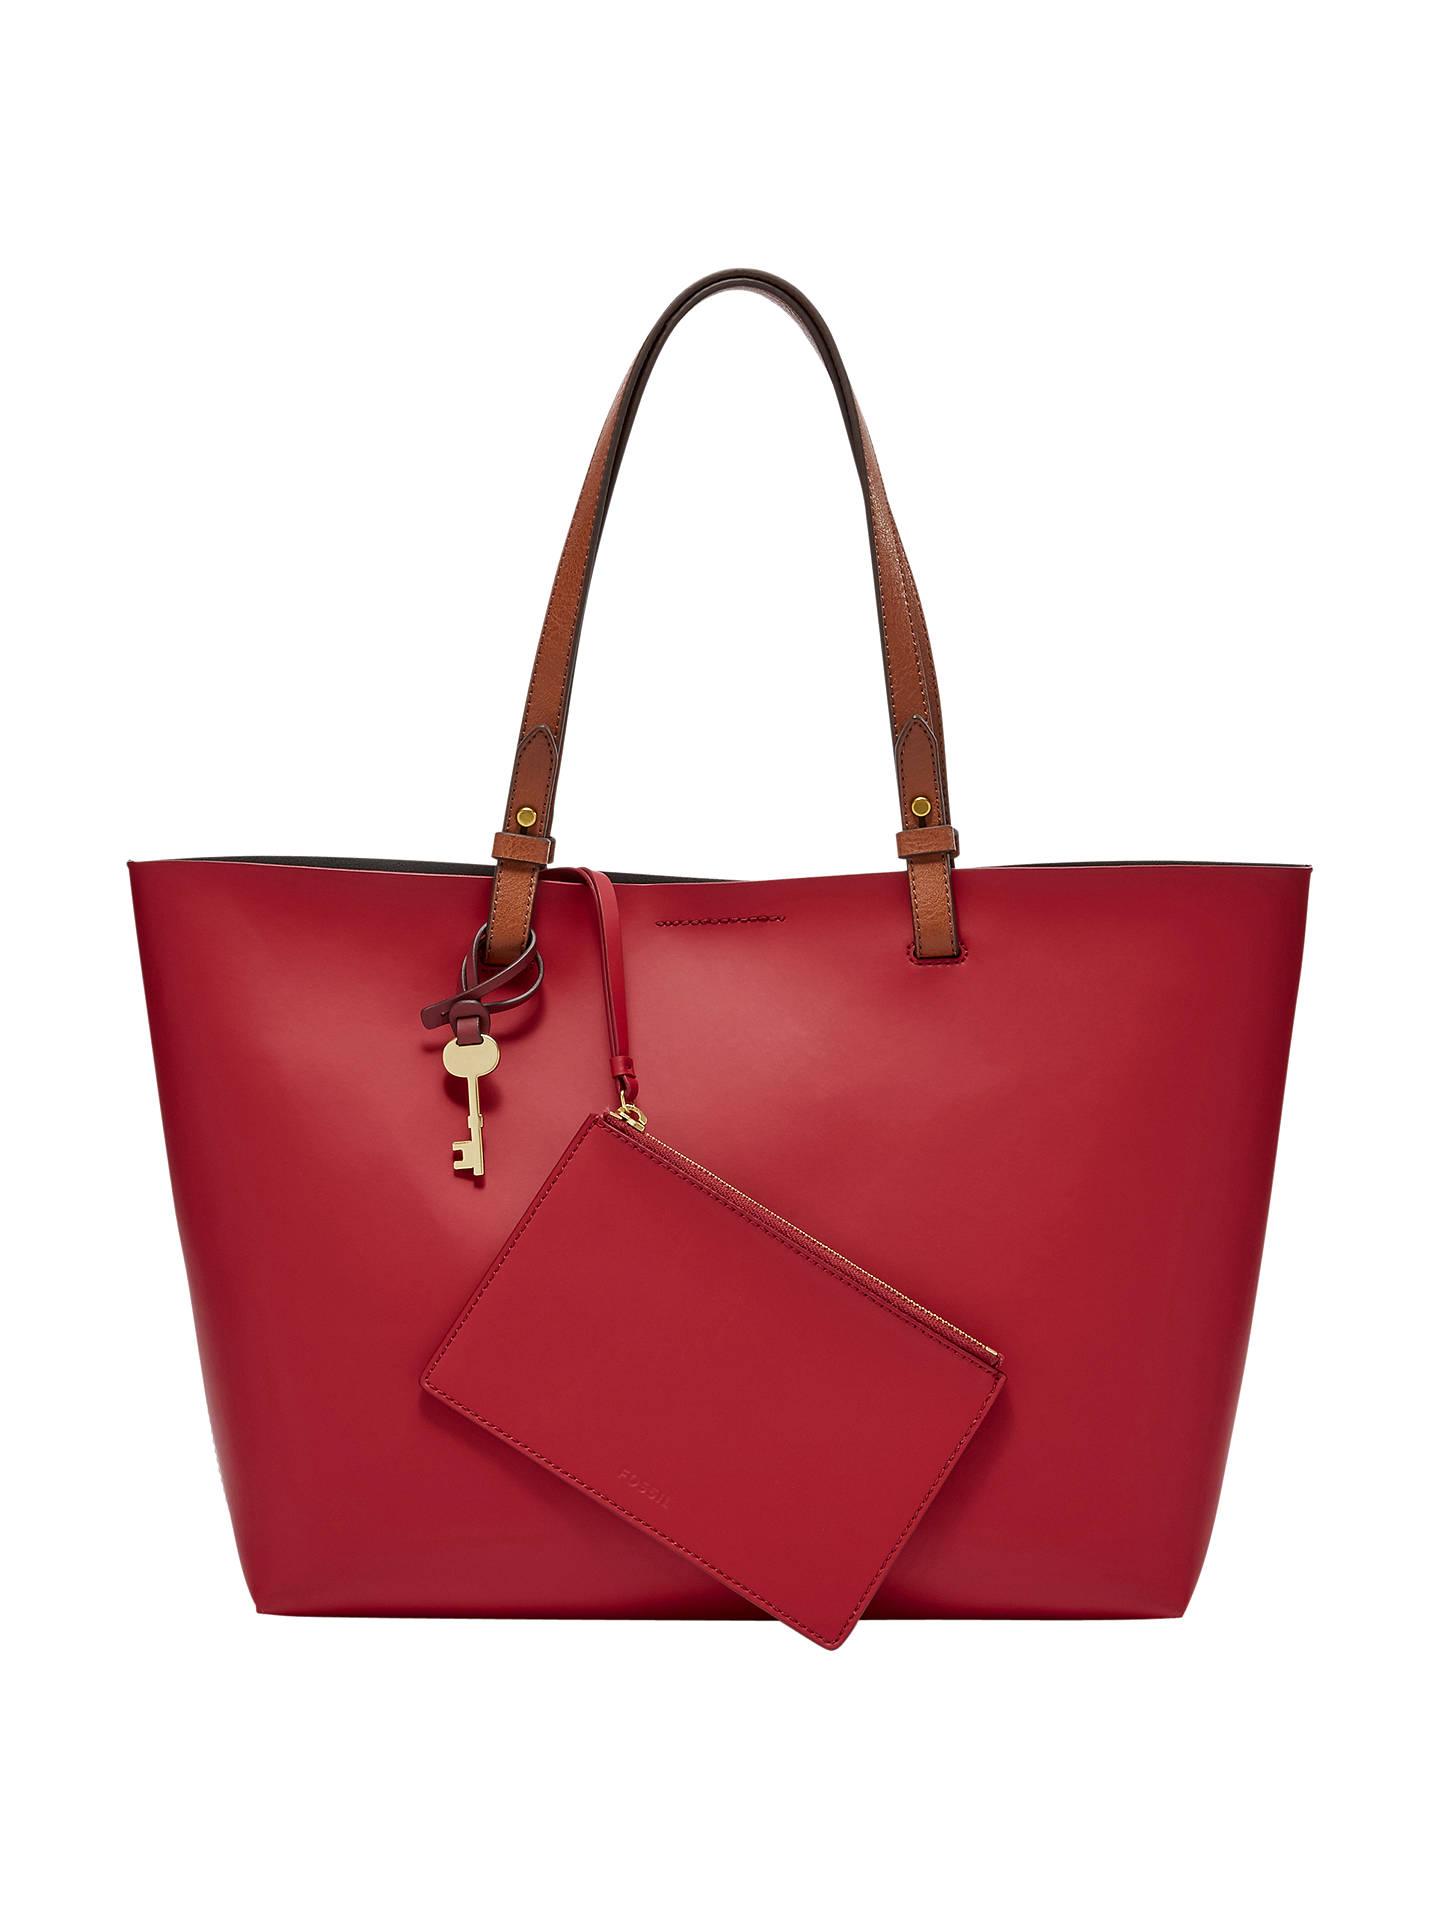 Fossil Rachel Leather Tote Bag Red Velvet Online At Johnlewis